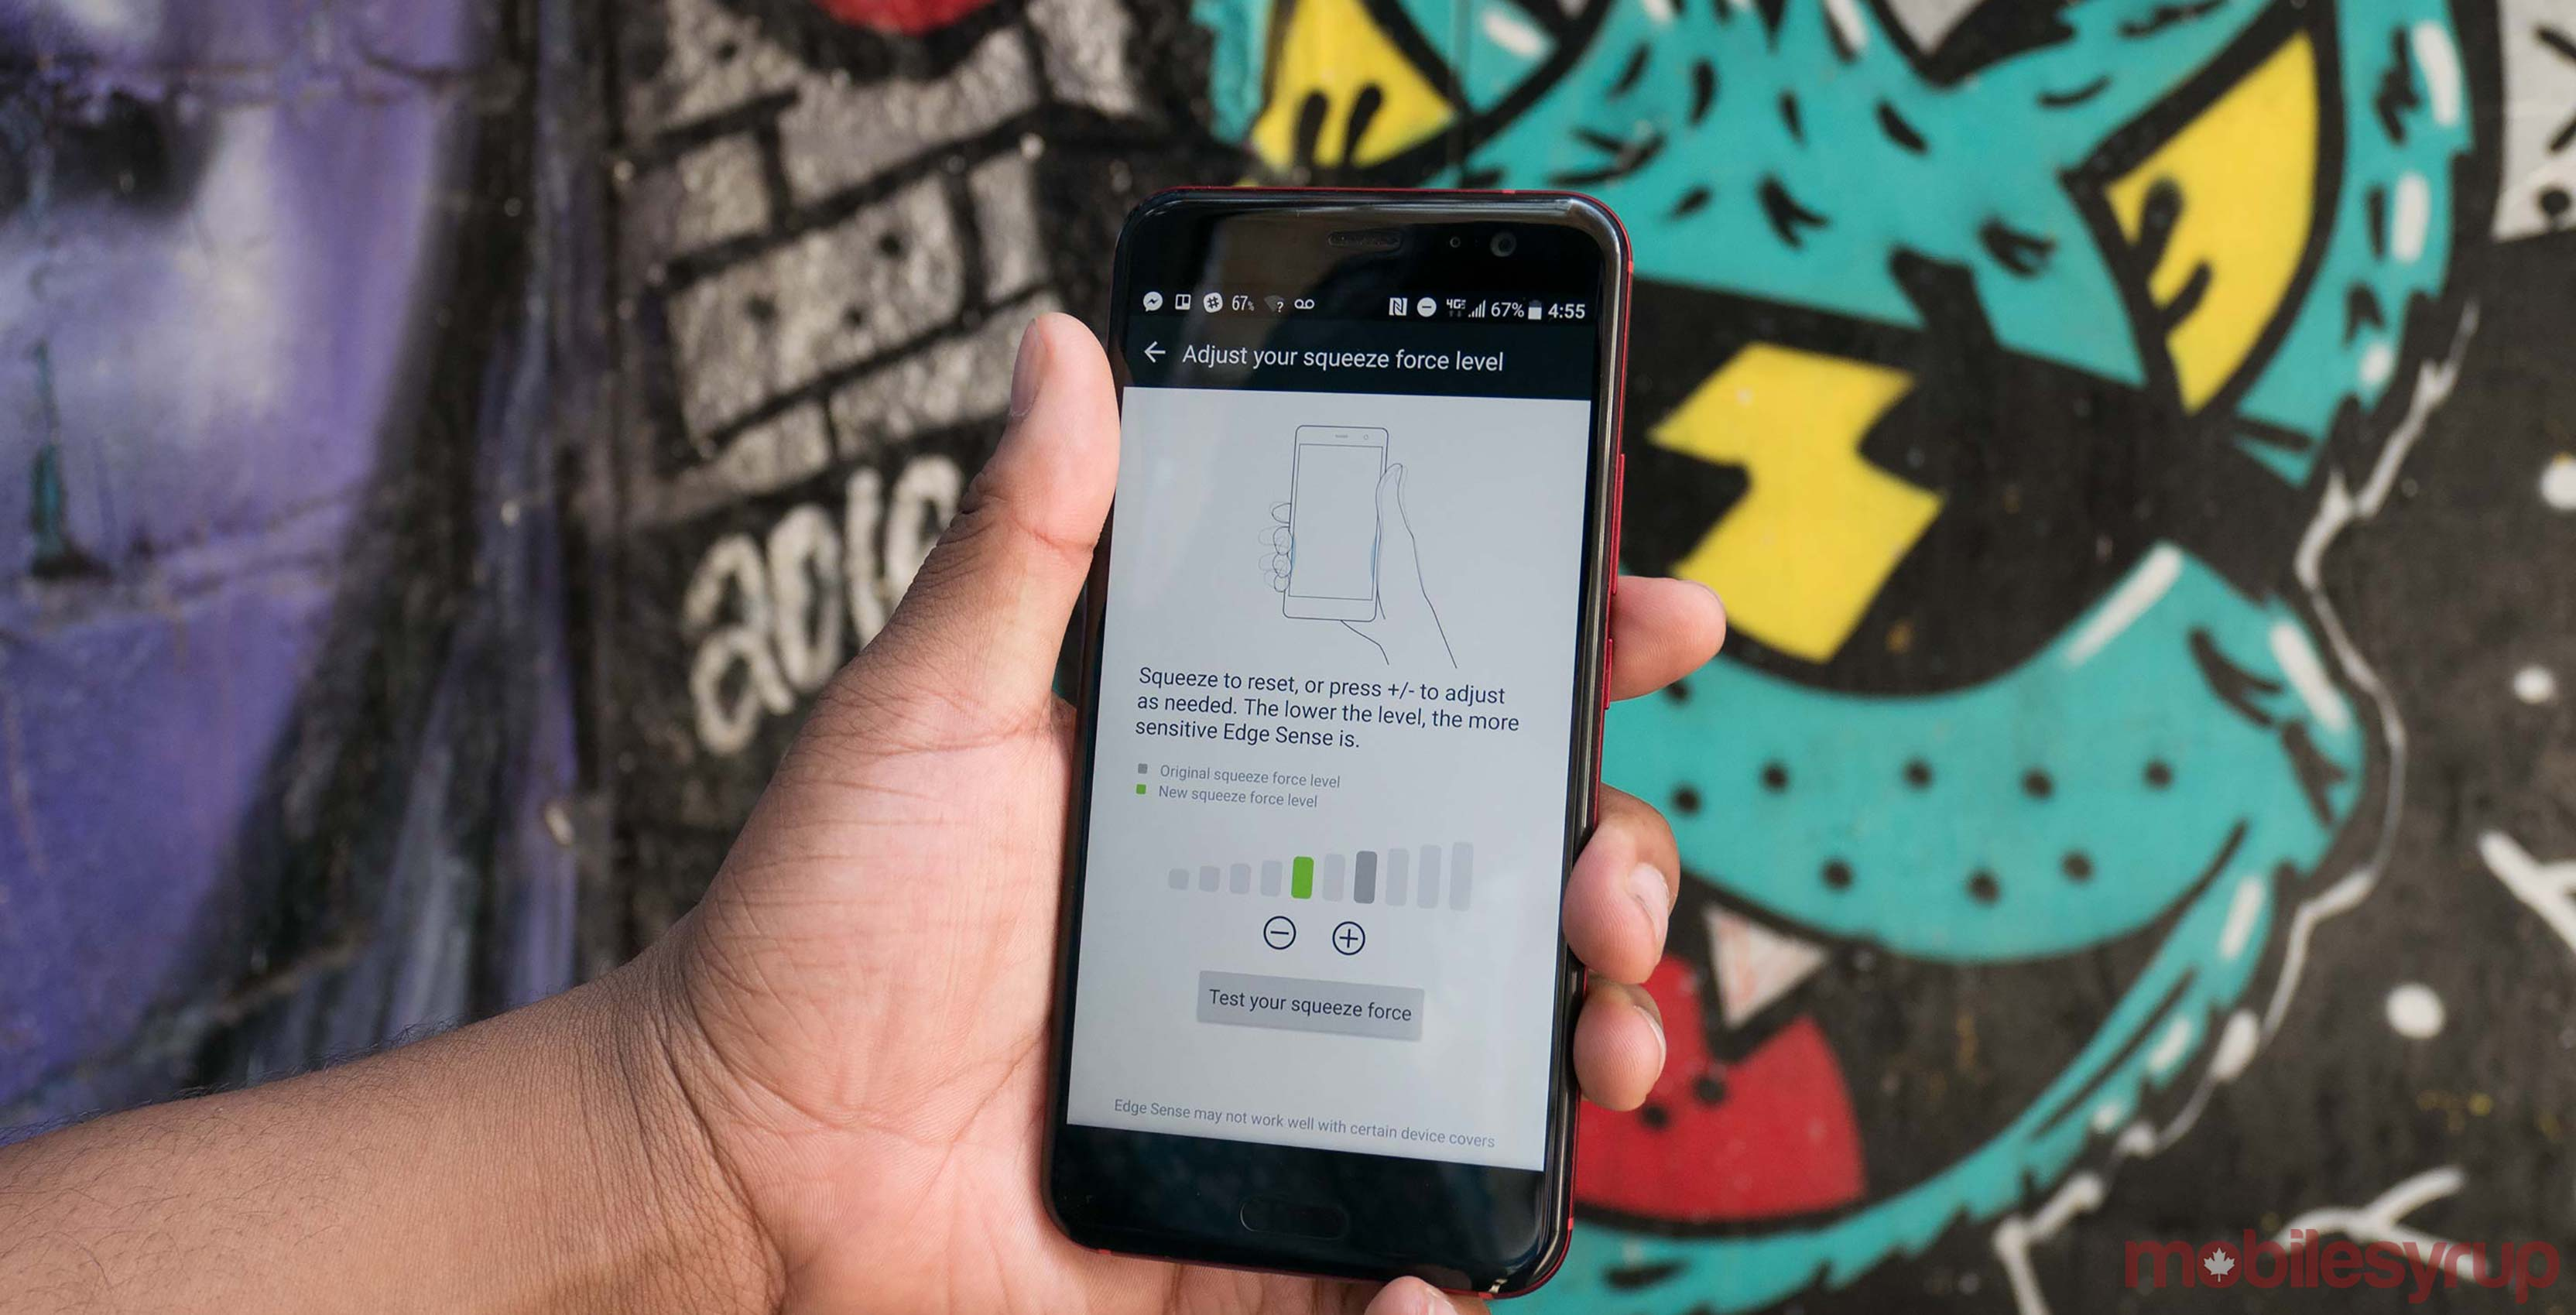 HTC U11 being squeezed, Edge Sense